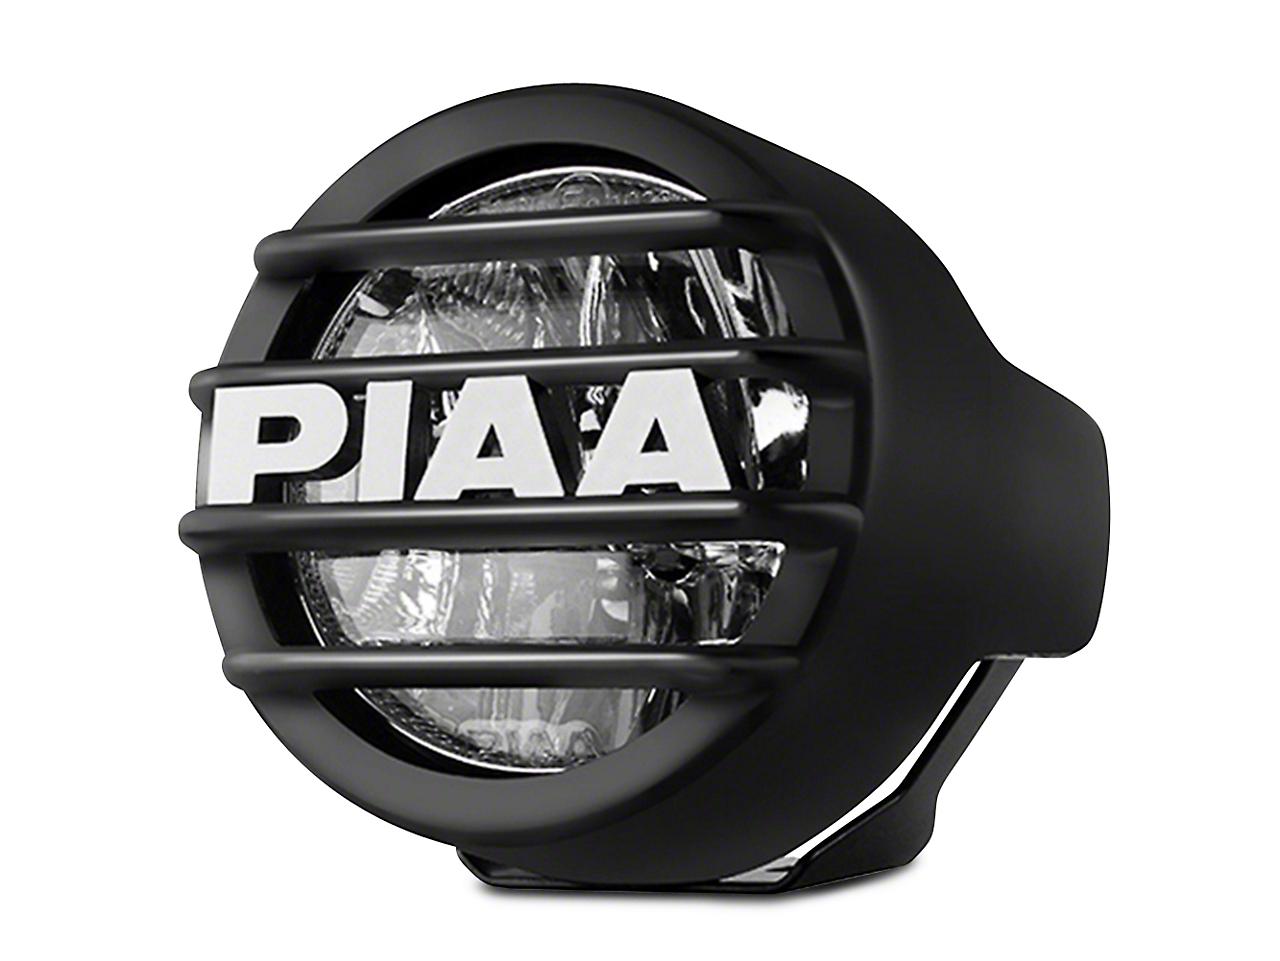 PIAA LP530 3.5 in. Round LED Light - Fog Beam (97-18 All)